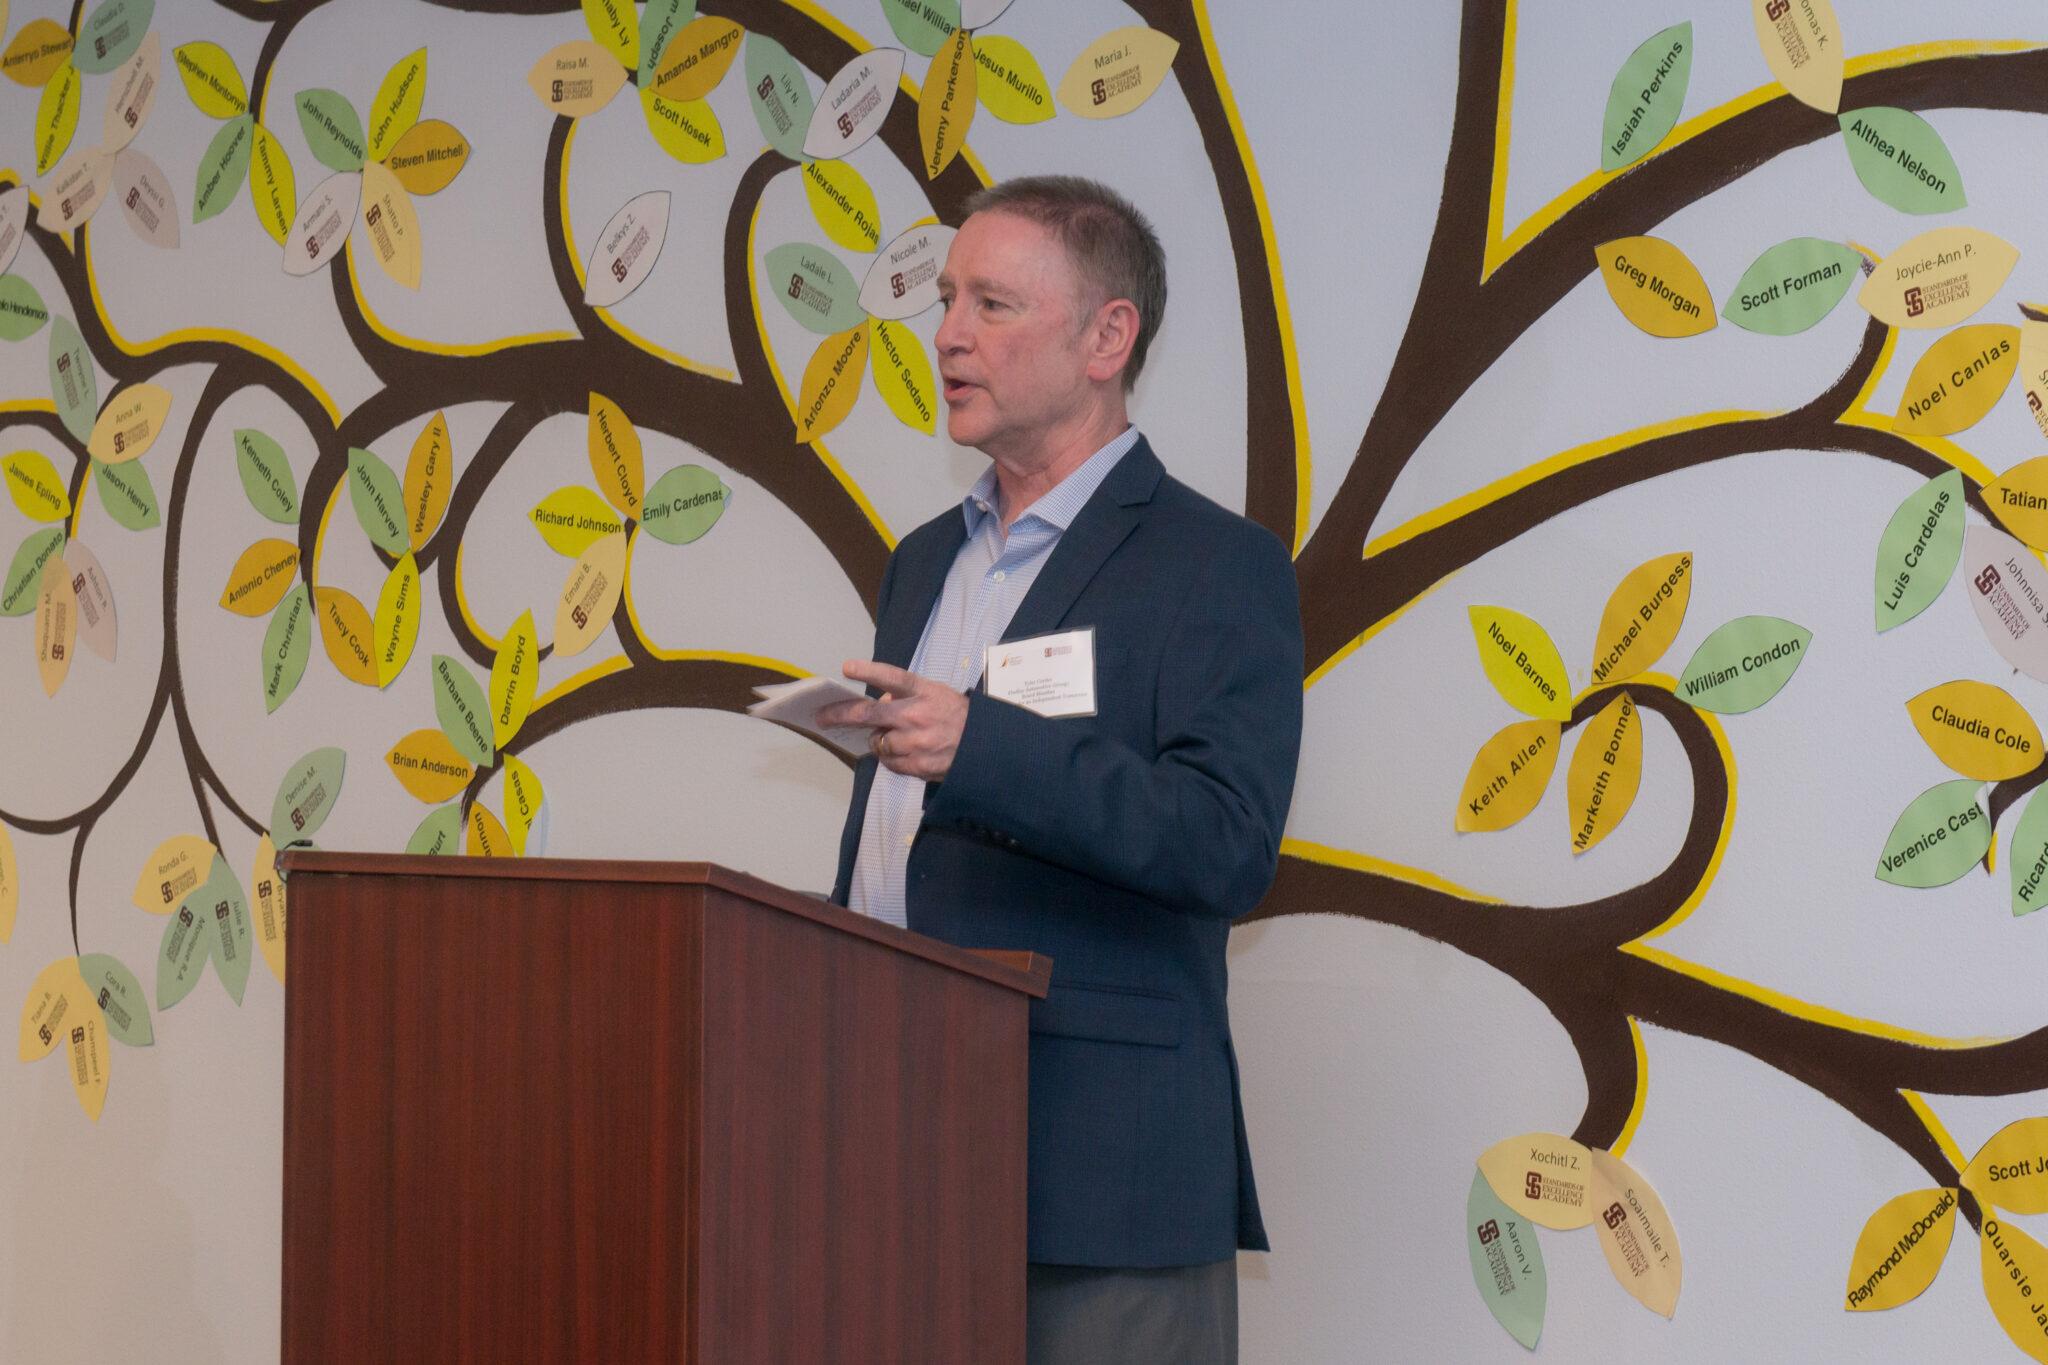 Tyler Corder - CFO Findlay Automotive Group - Inaugural Speaker